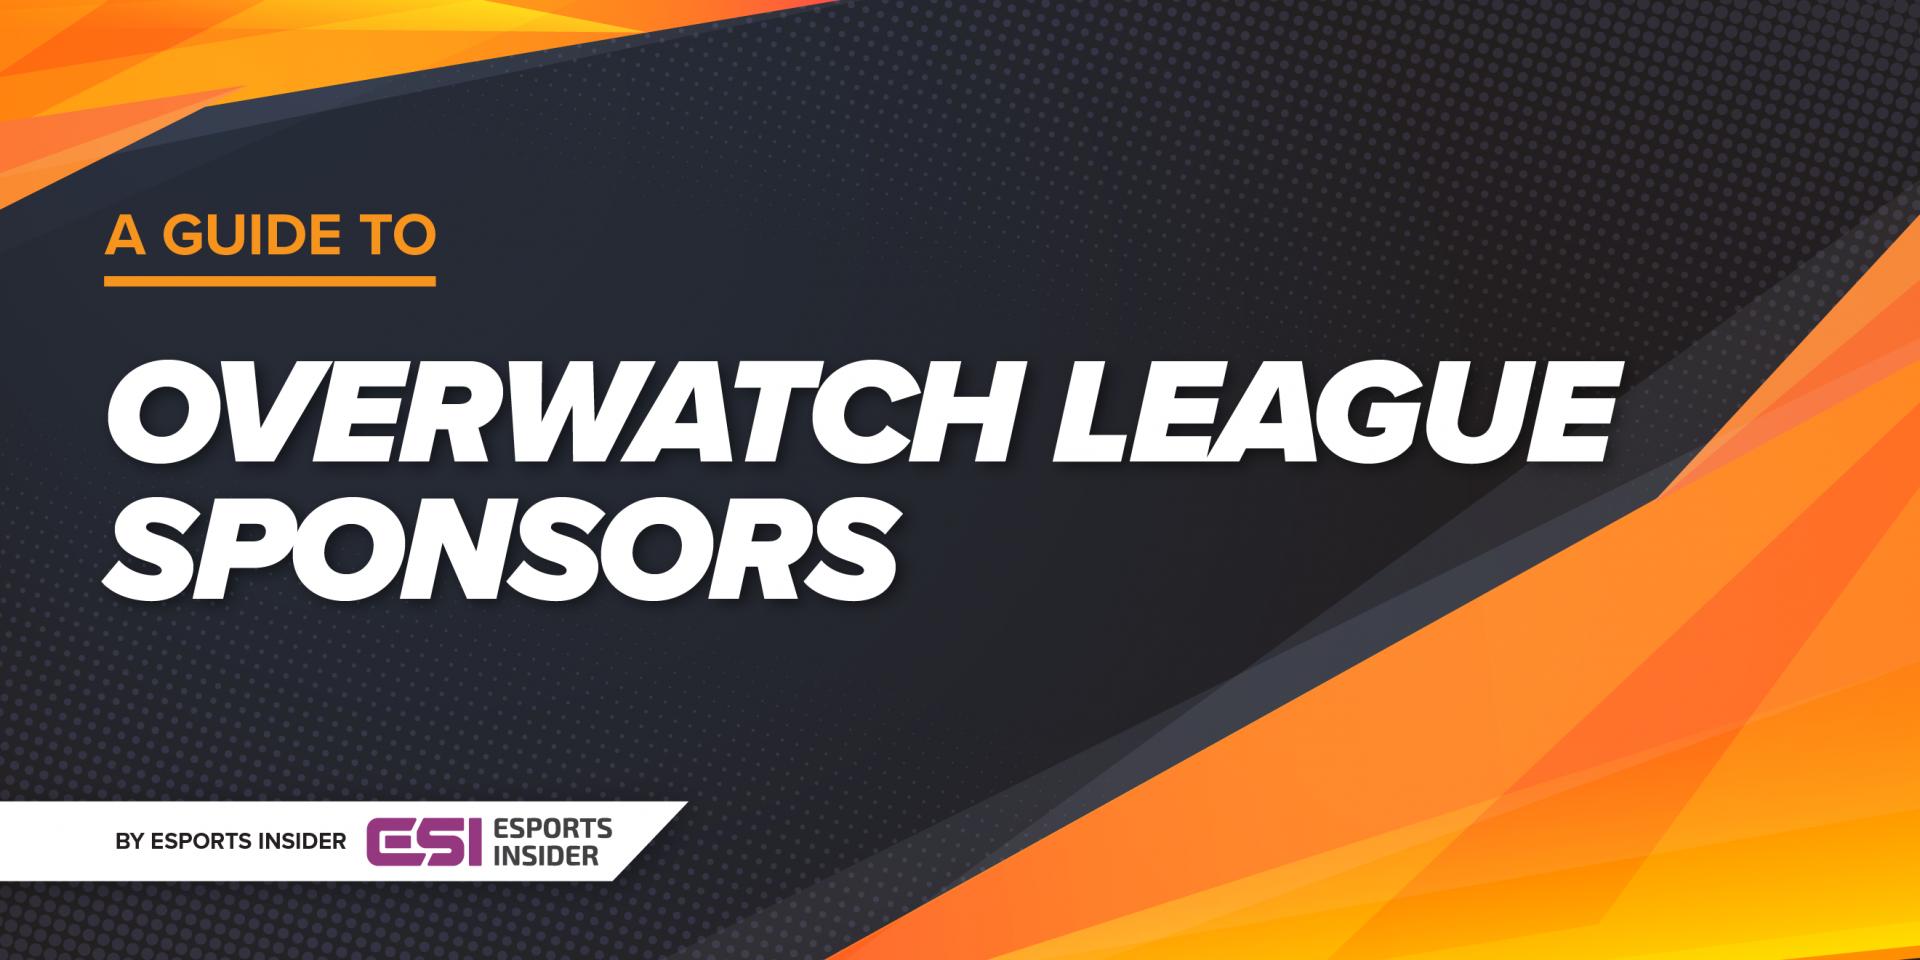 Overwatch League sponsors